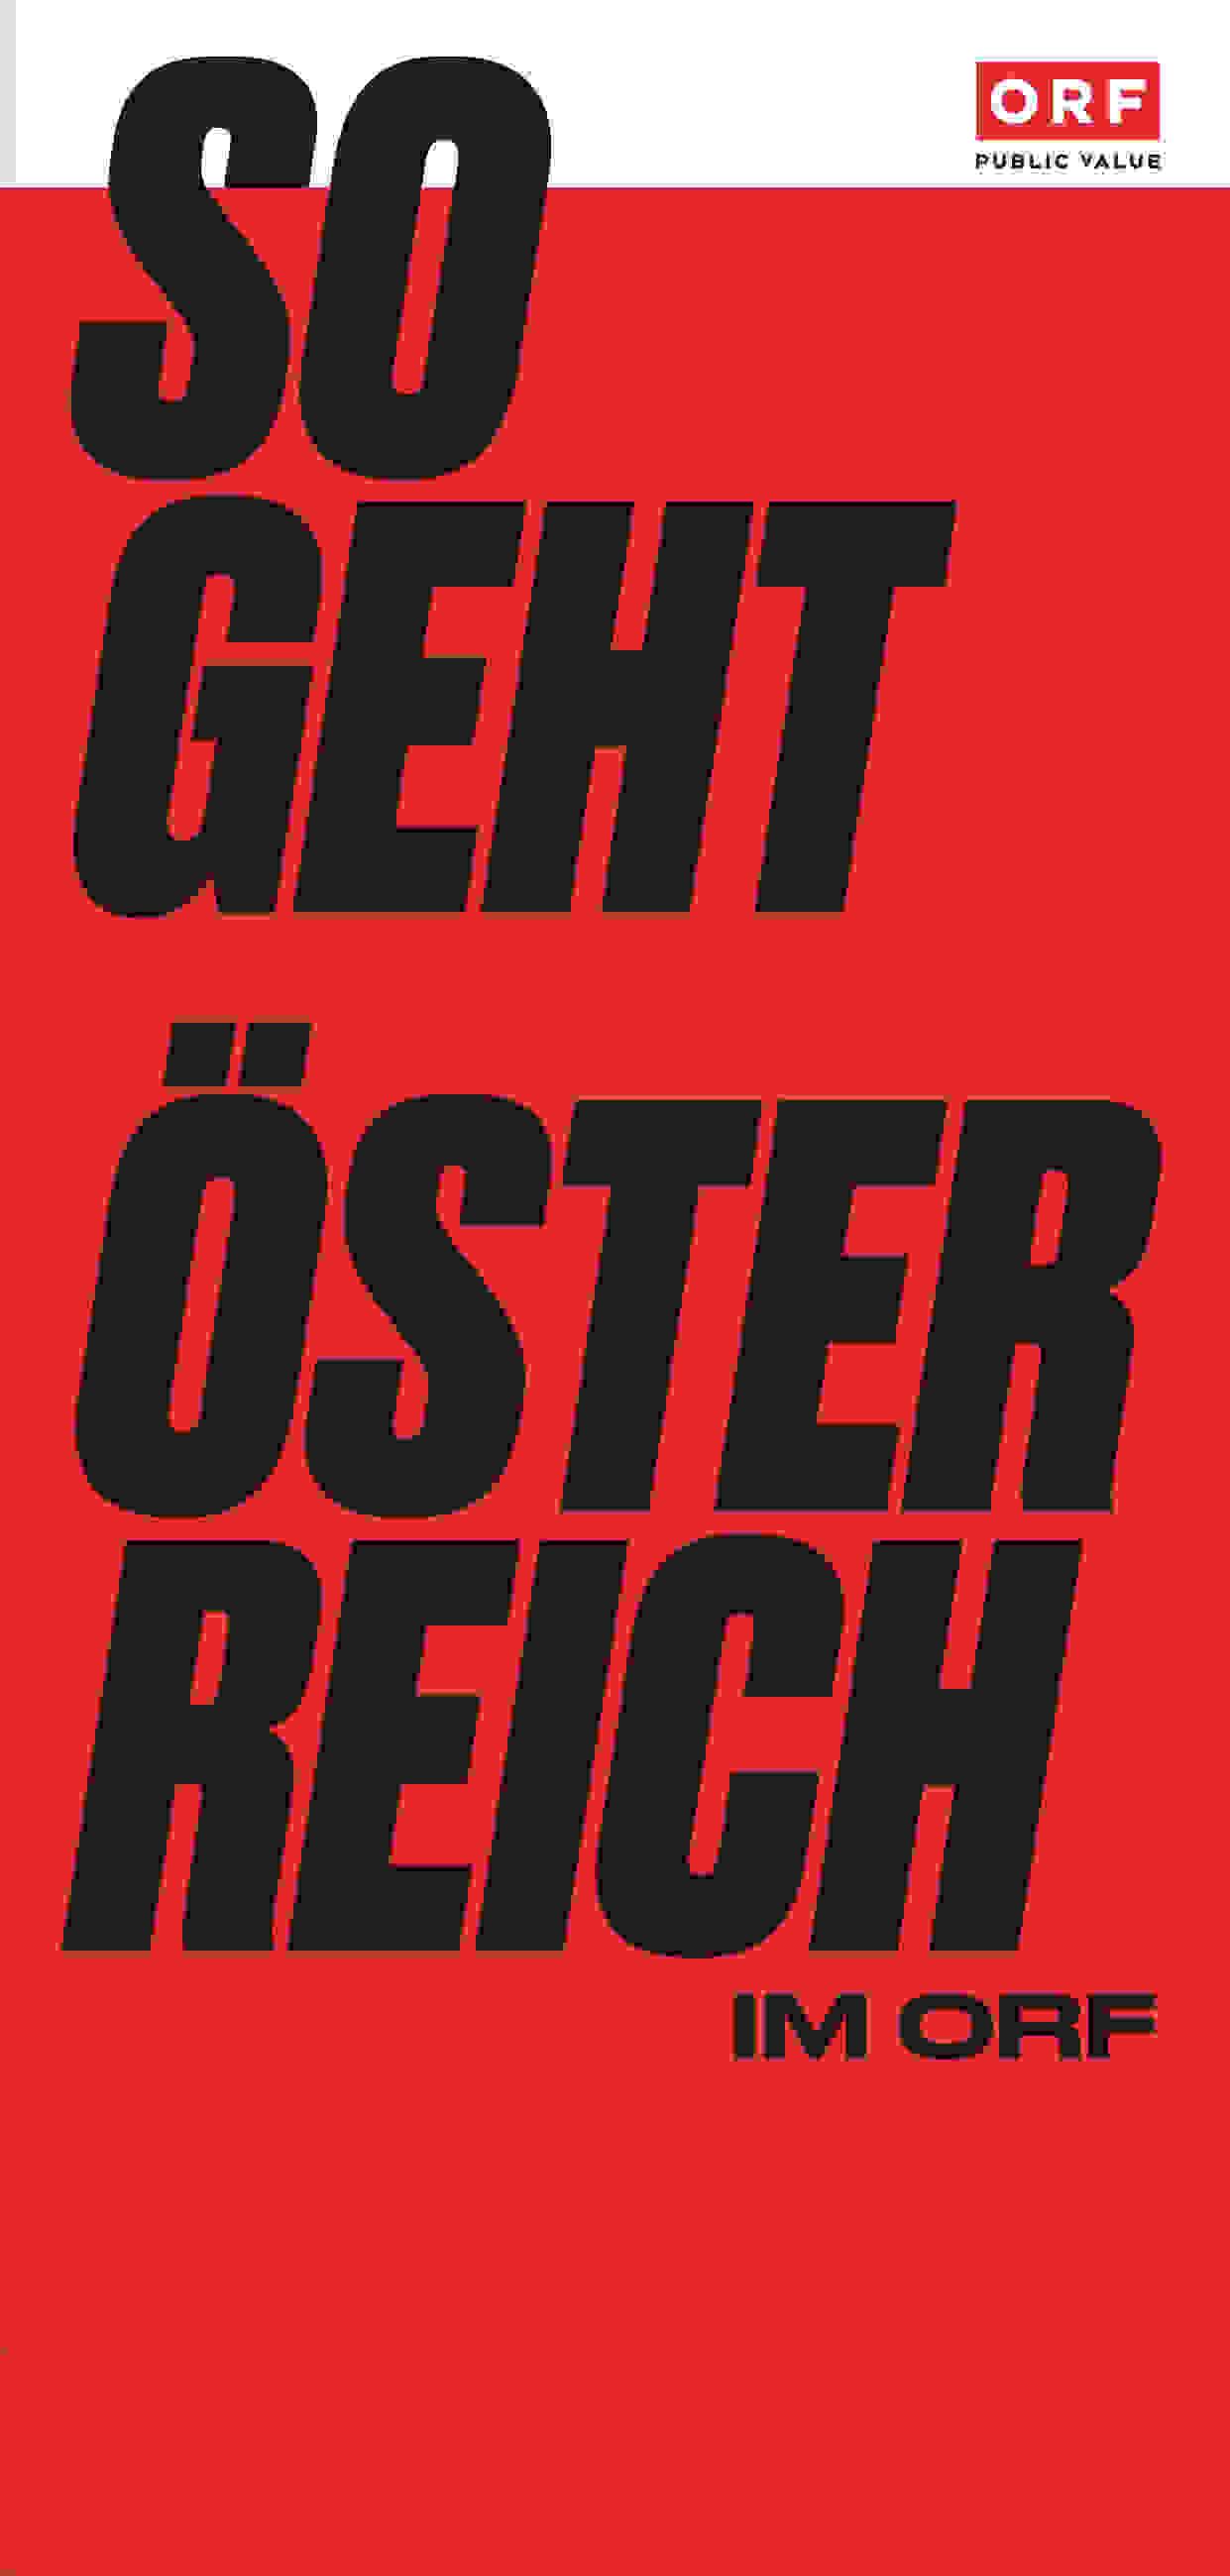 ORF PV 2020 Slider Cover Oesterreich